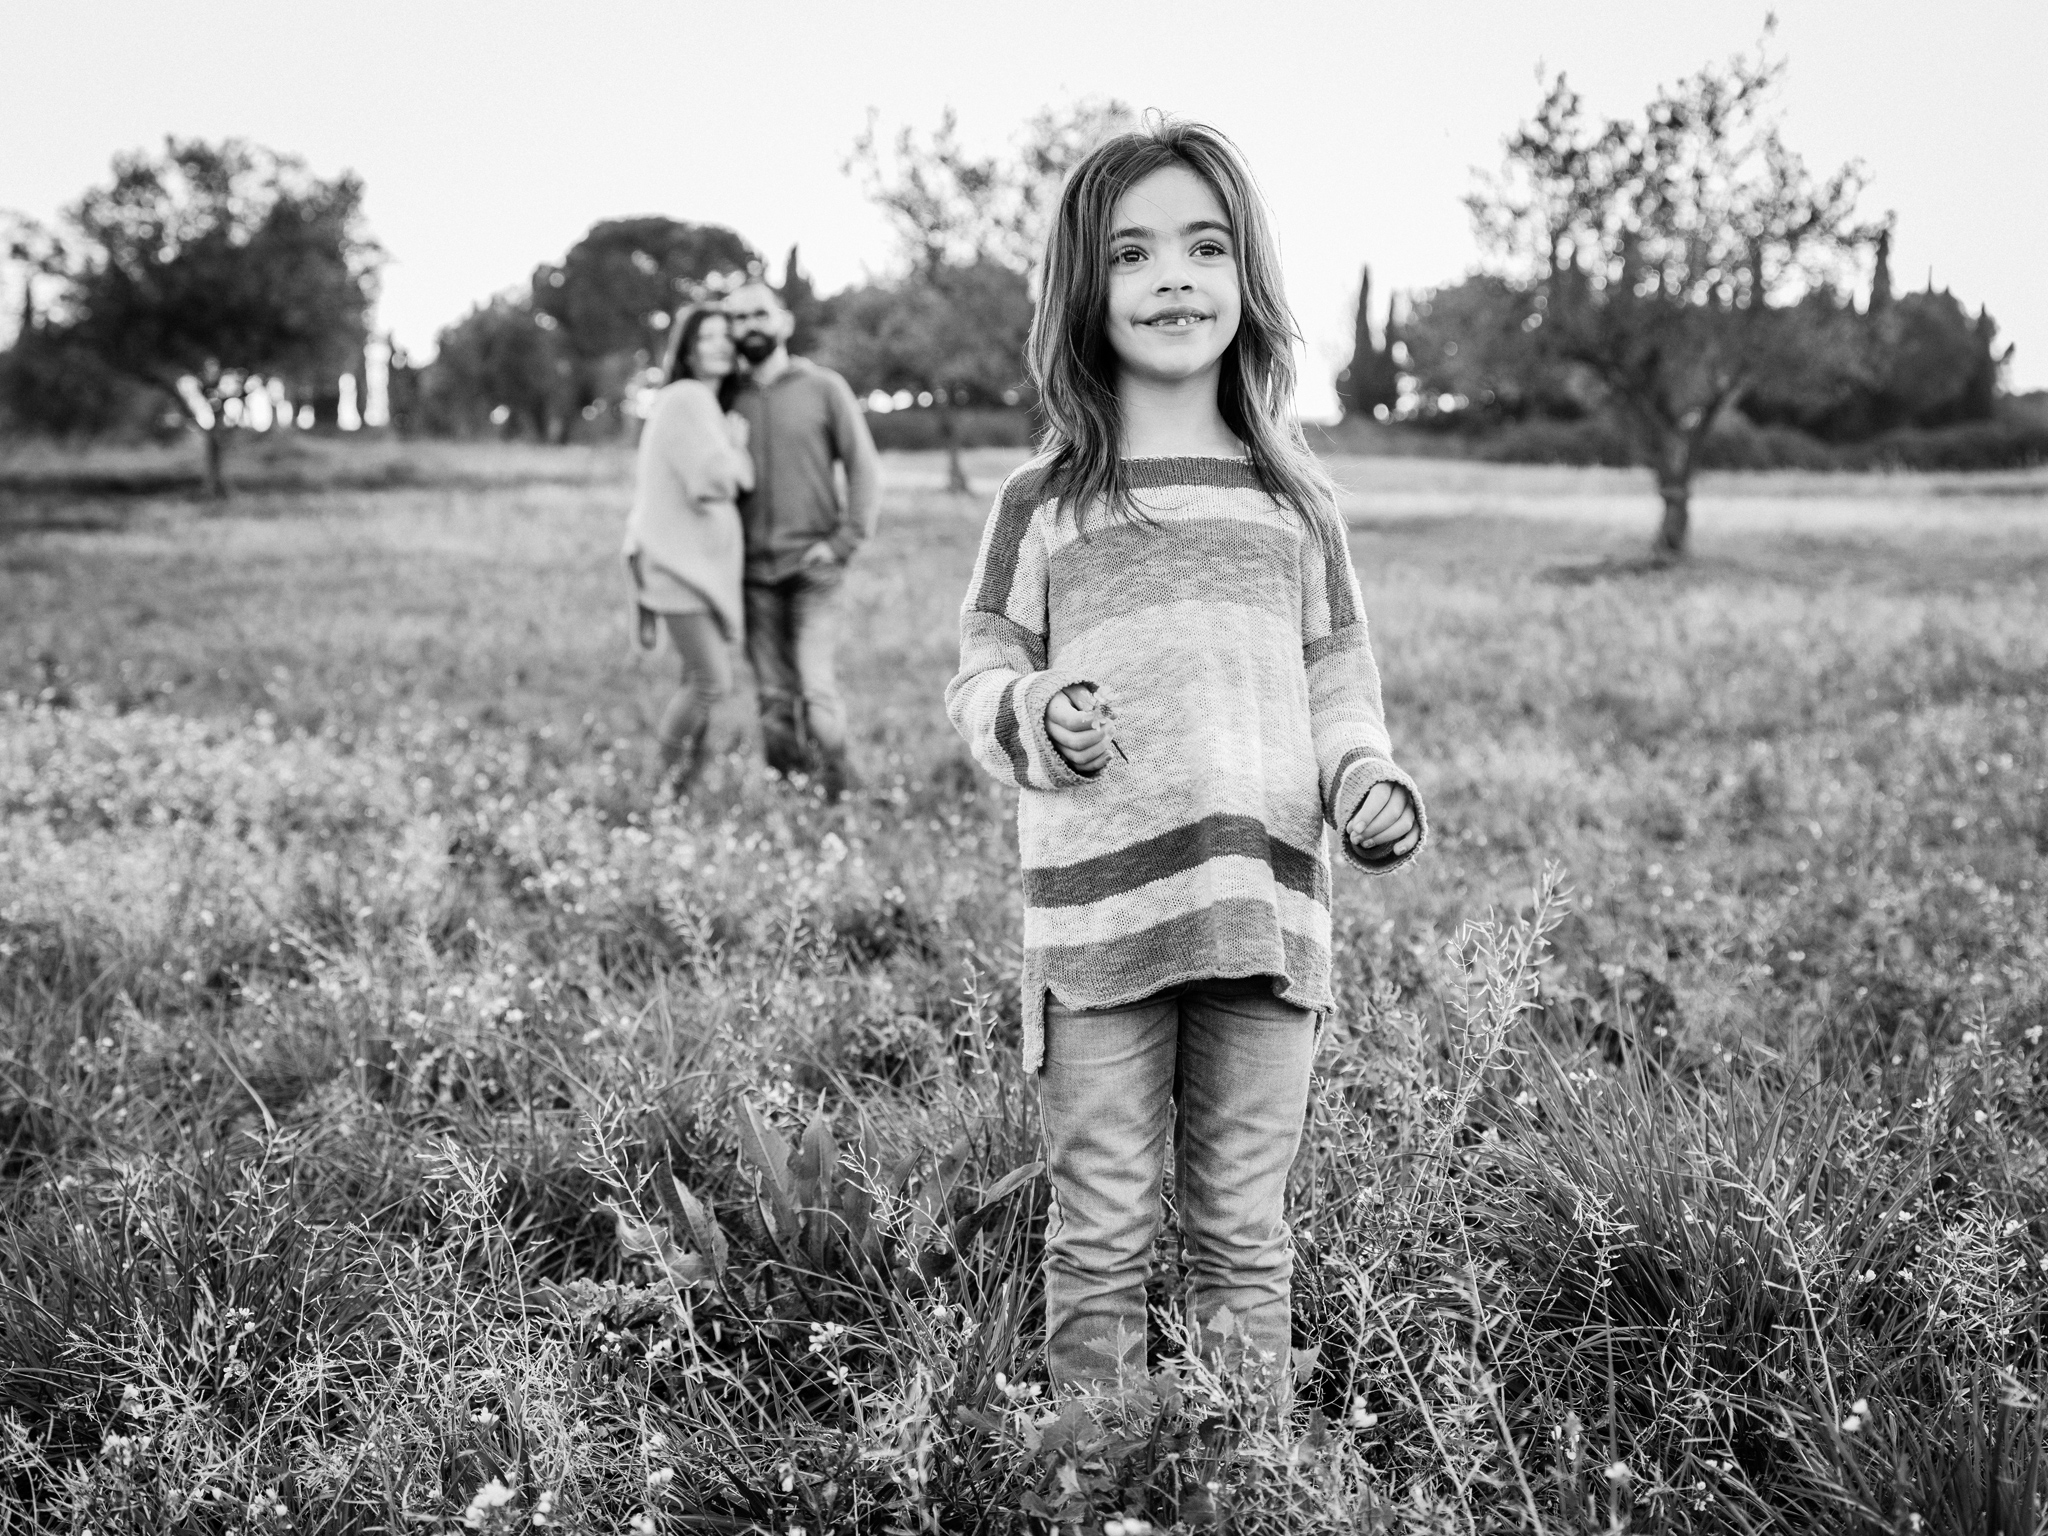 fotografia-infantil-familiar24.jpg